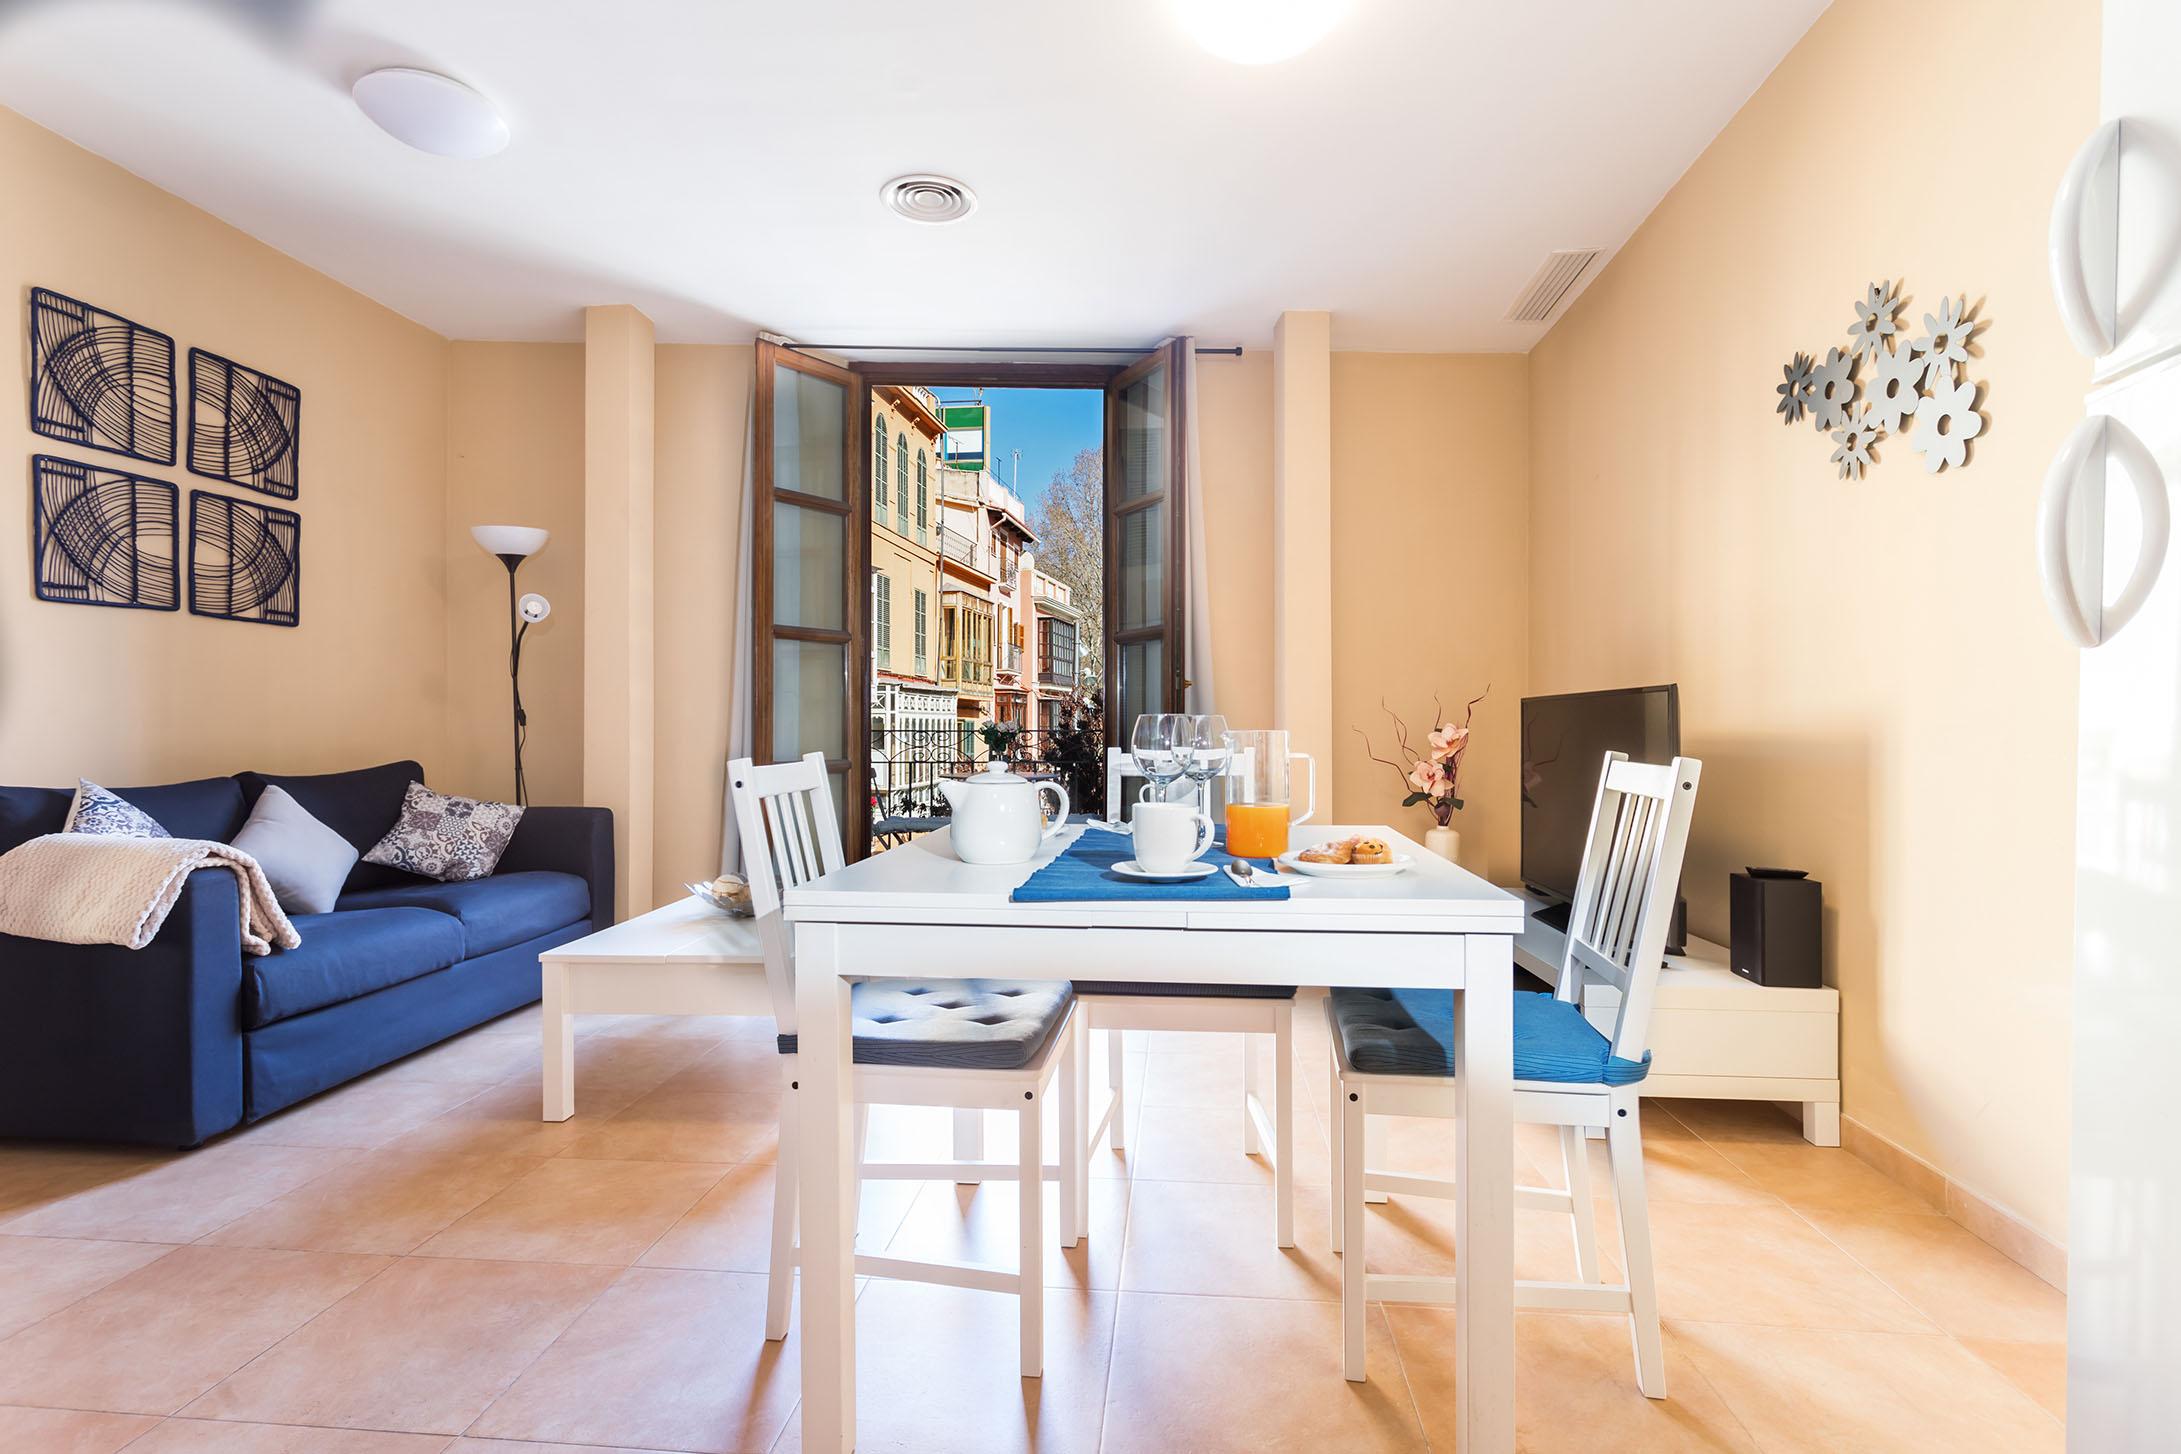 Borne-Suites-Apartamento-Superior-2-Pax-Palma-de-Mallorca-Comedor